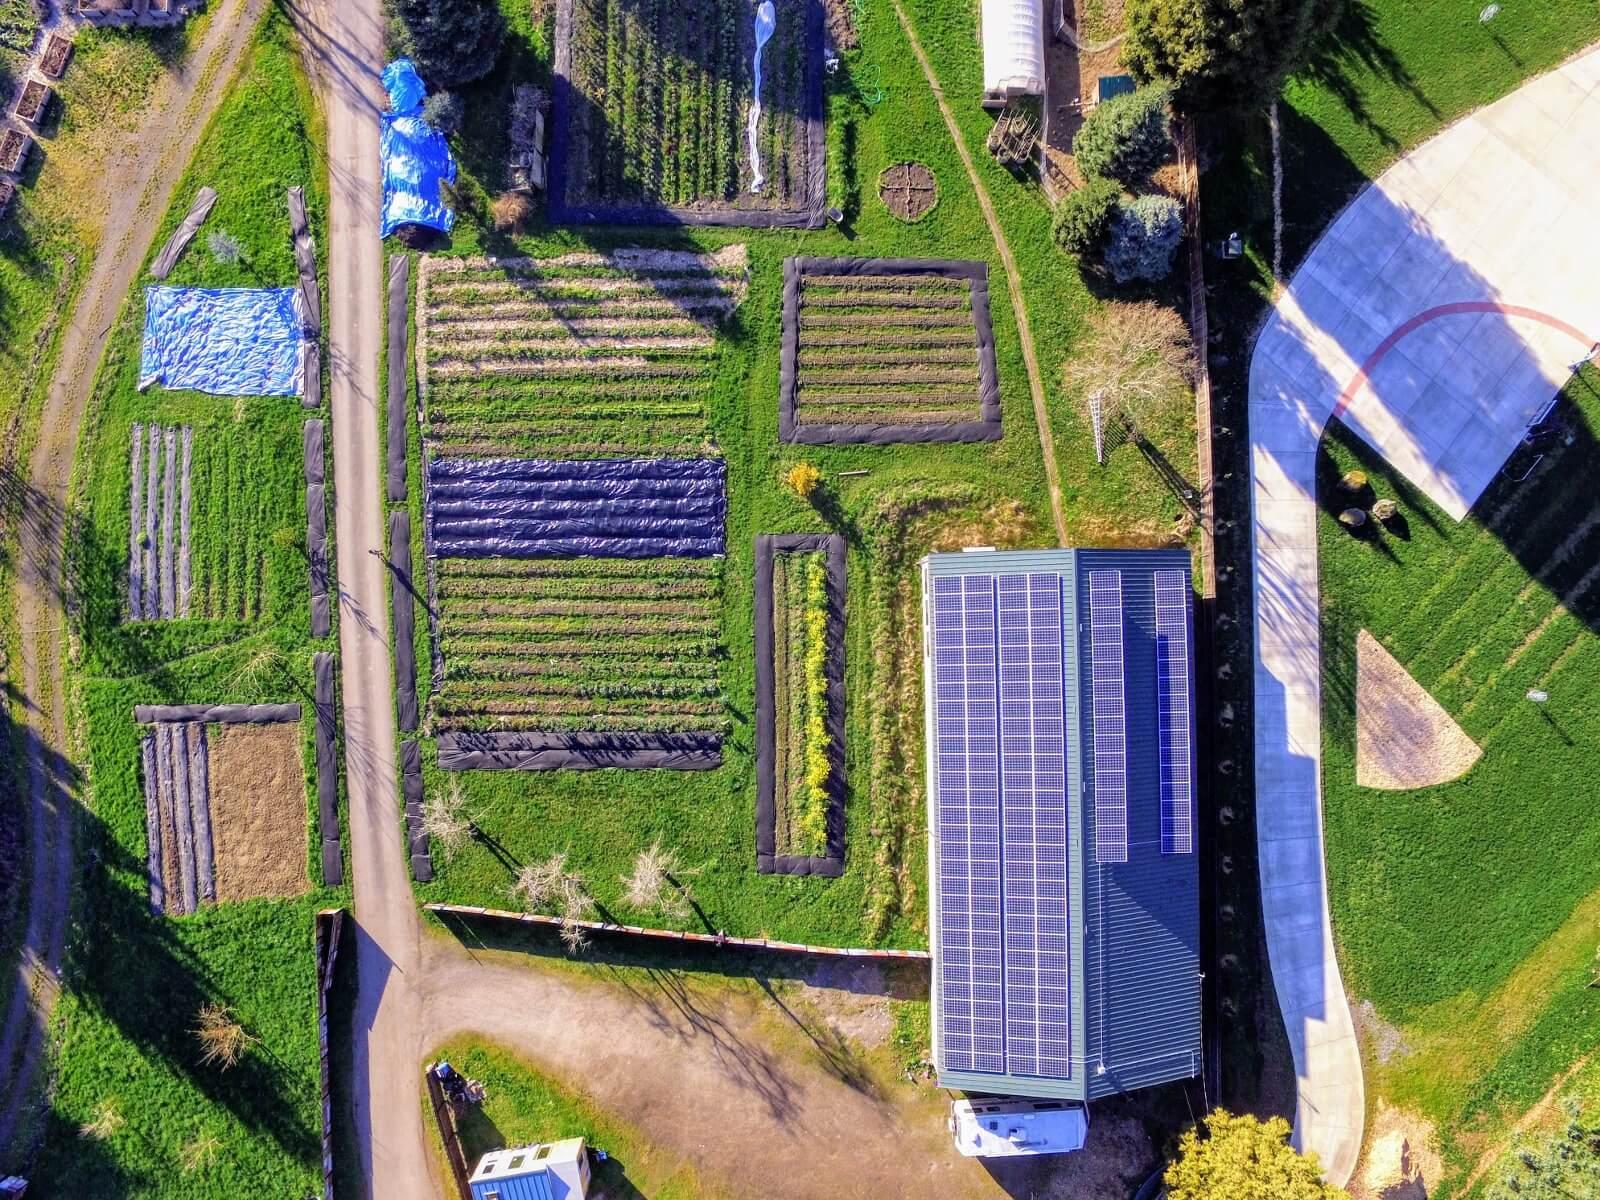 solar farm pacfific northwest.jpeg